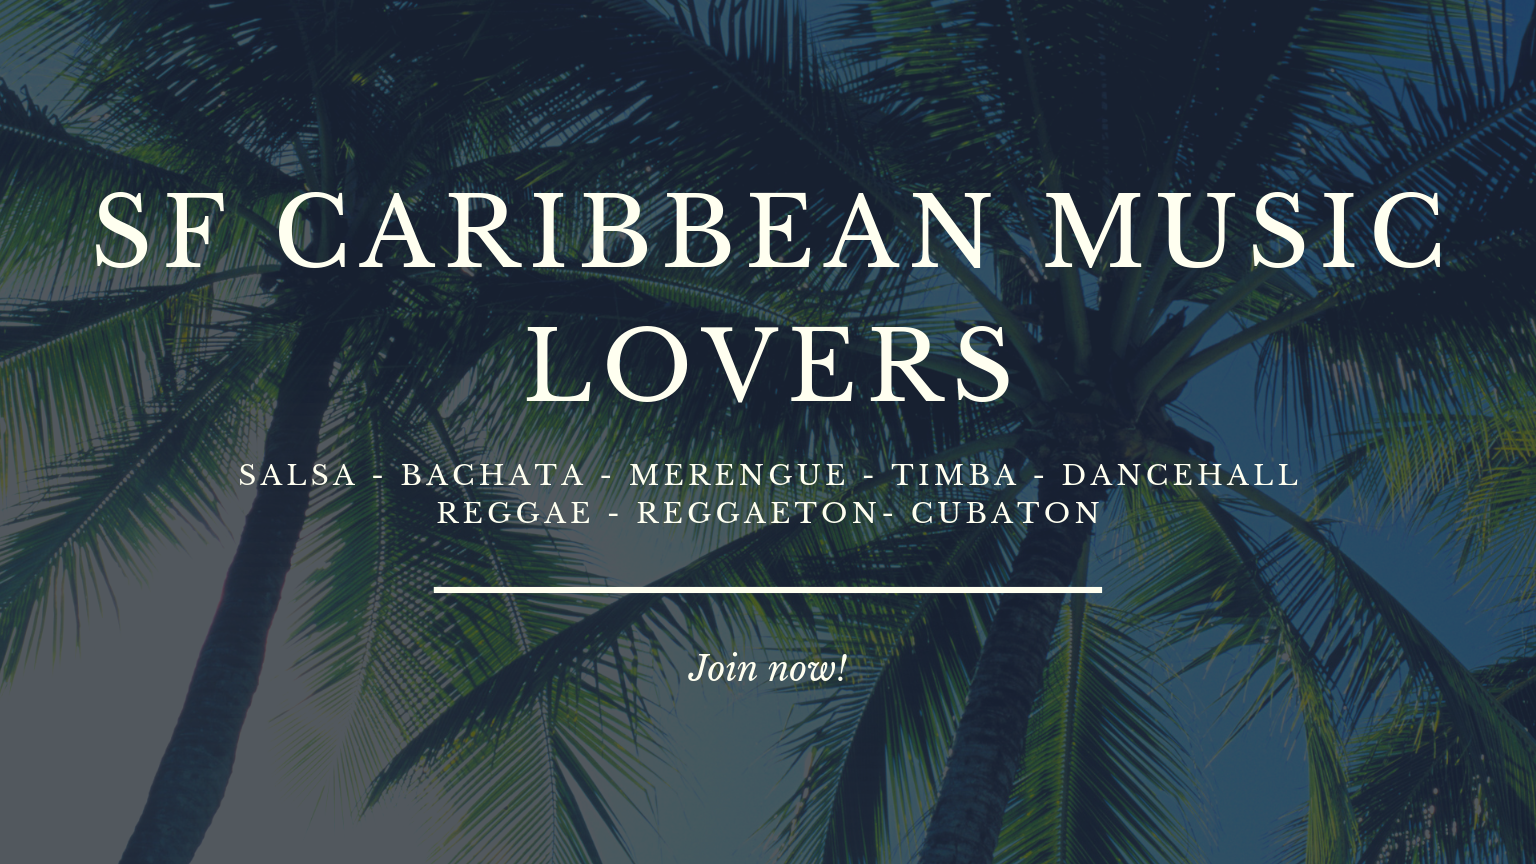 SF Caribbean Music Lovers